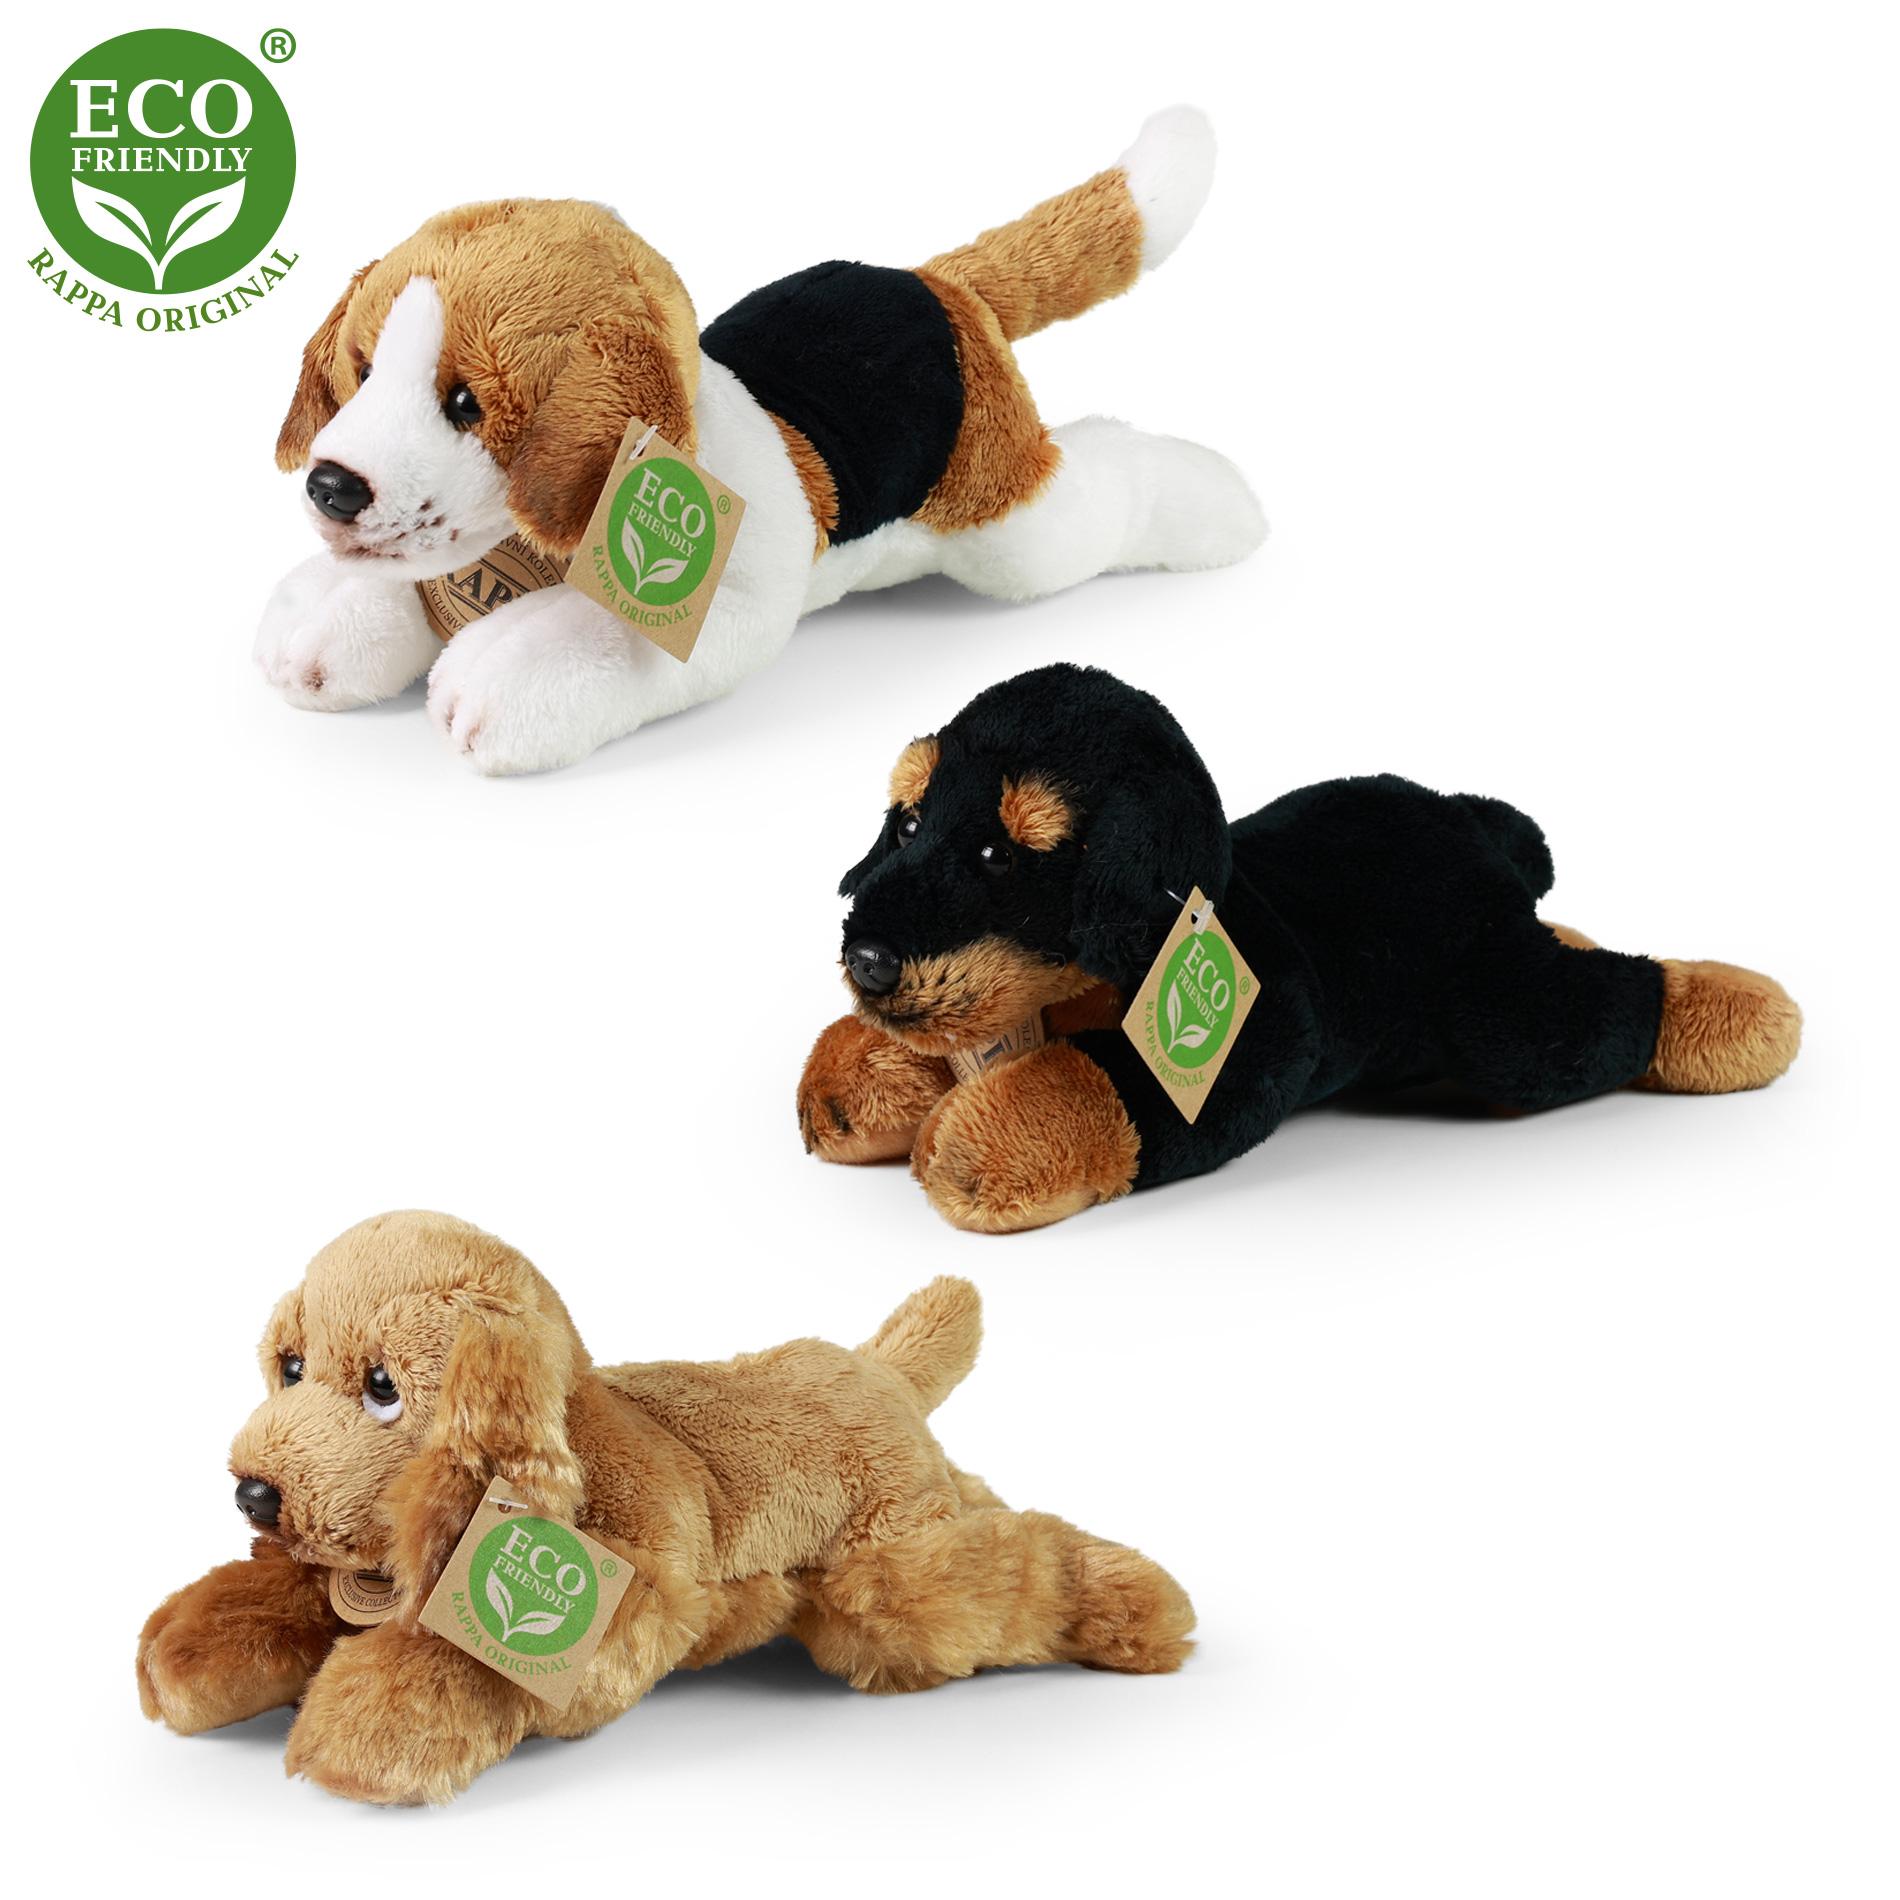 plyšový pes ležiaci, 3 druhy, 18 cm